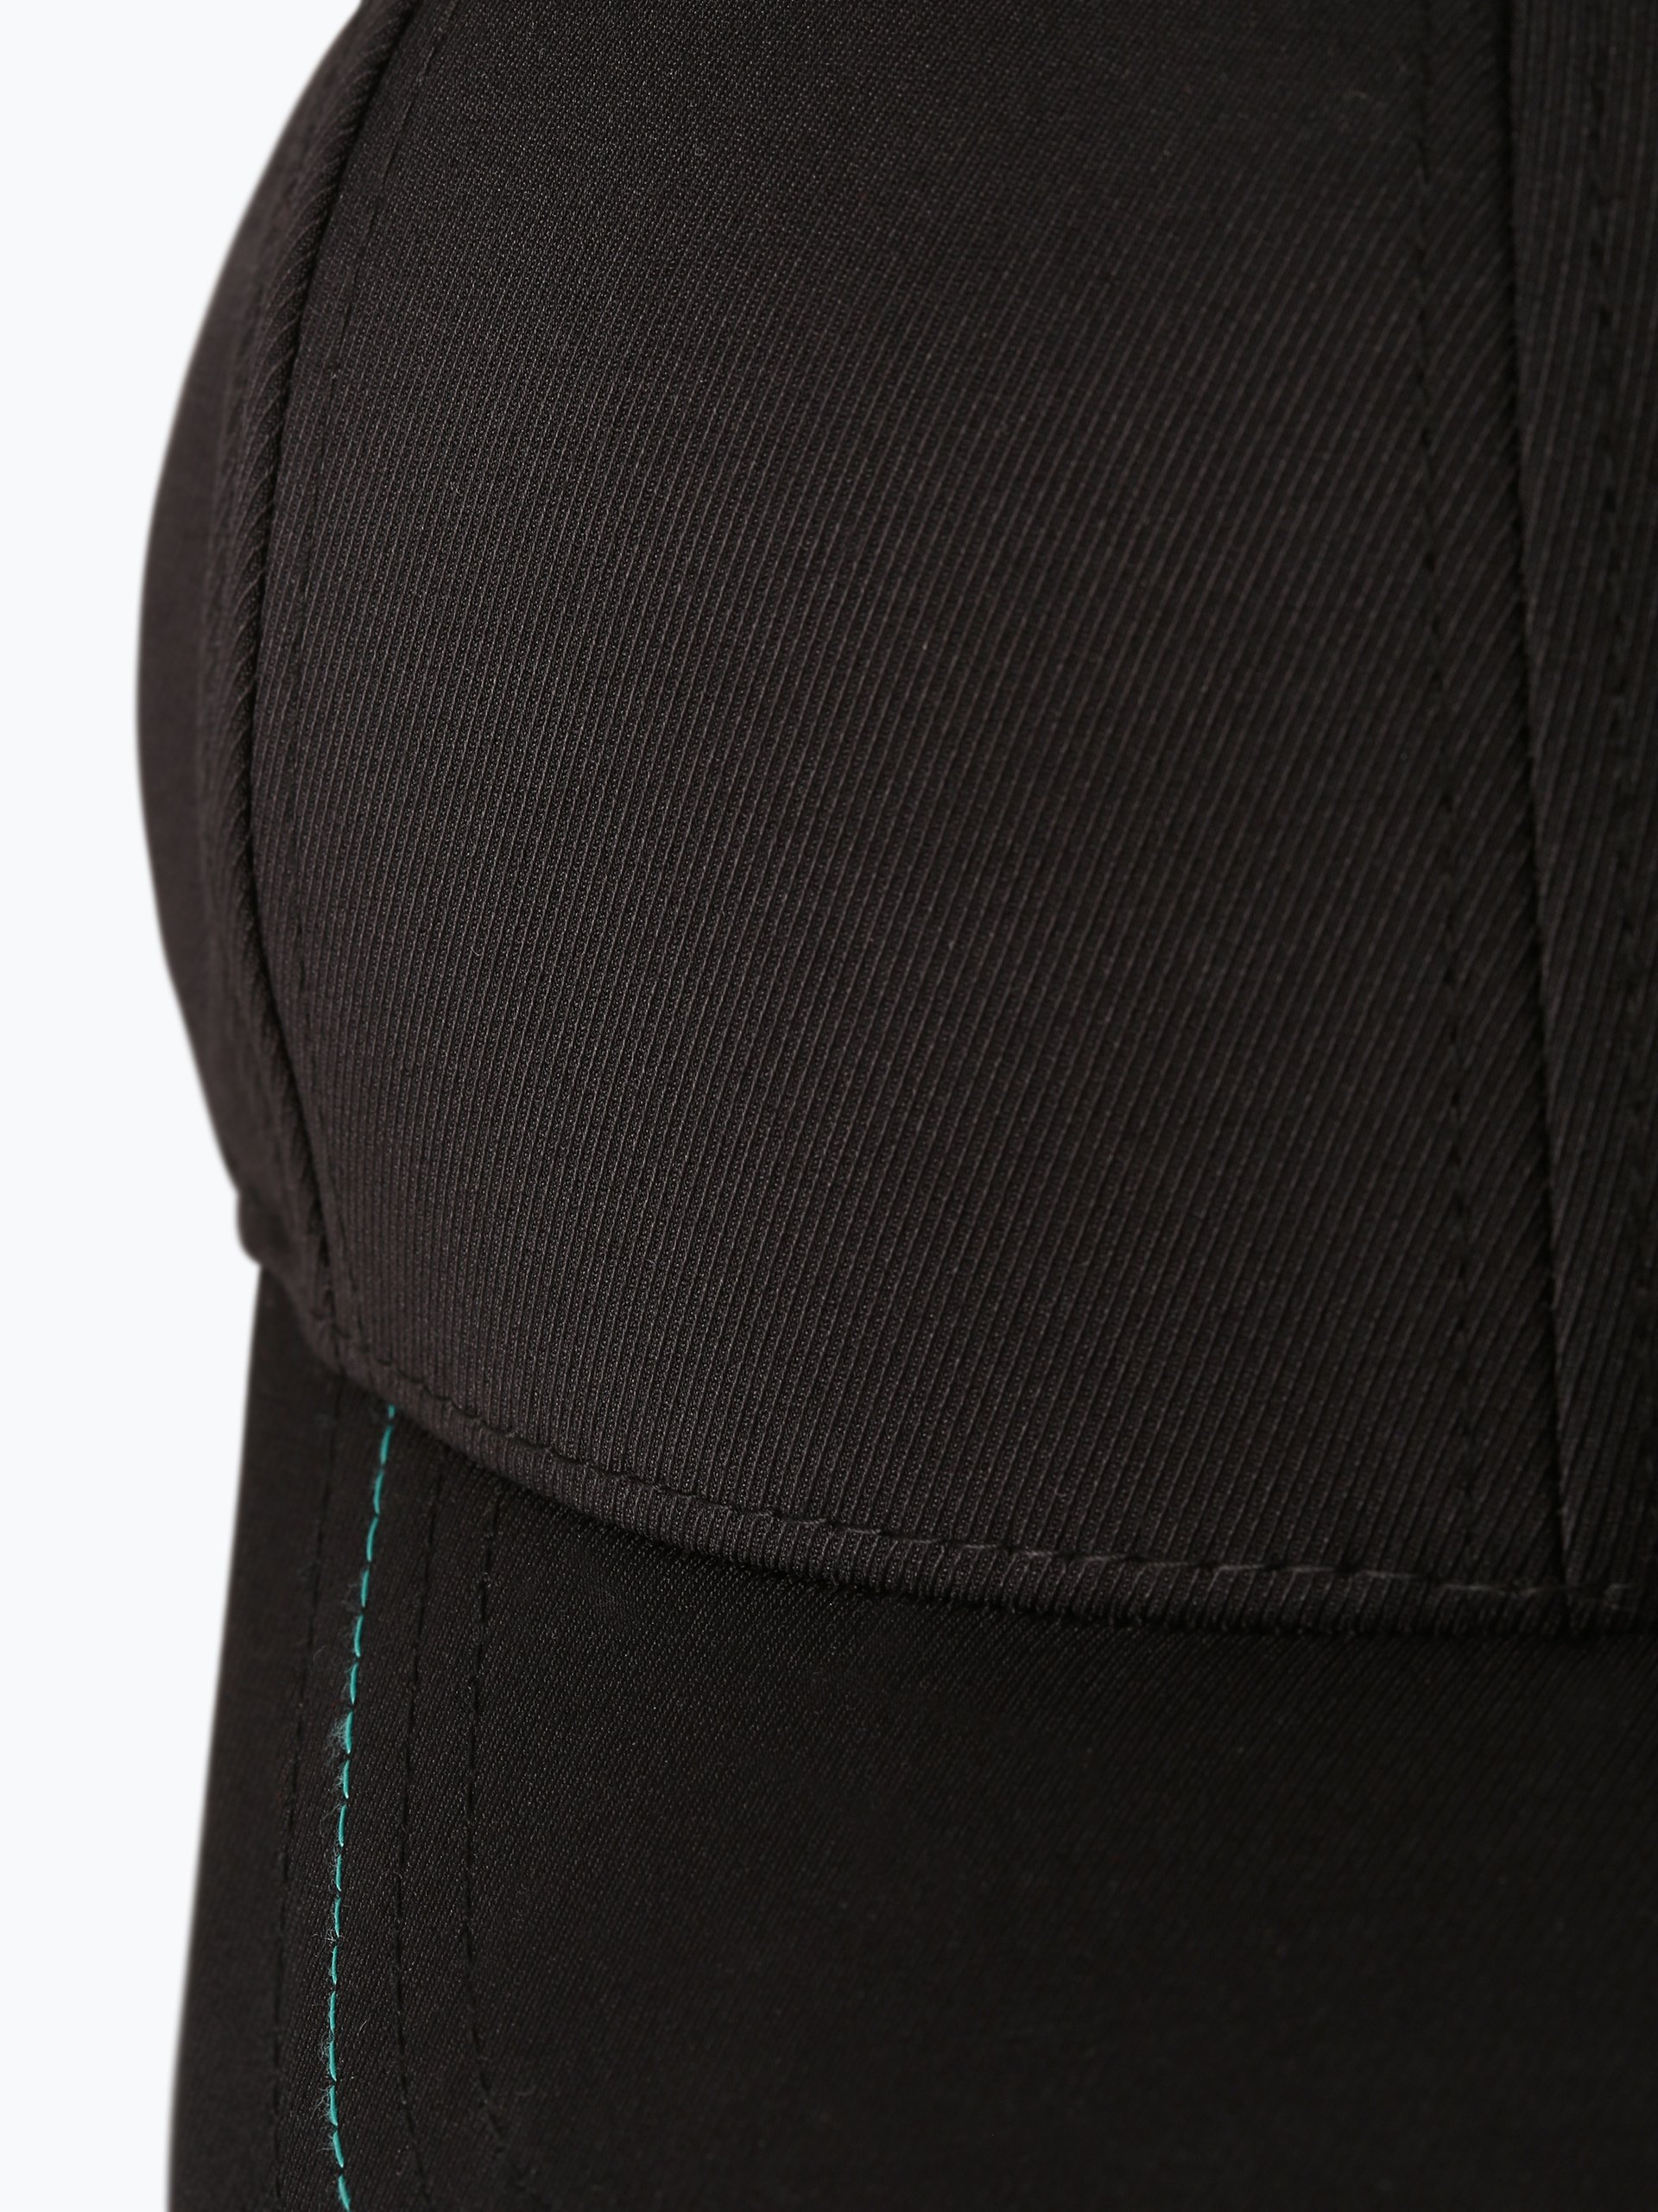 BOSS Athleisure Męska czapka z daszkiem – Cap-Logarithm